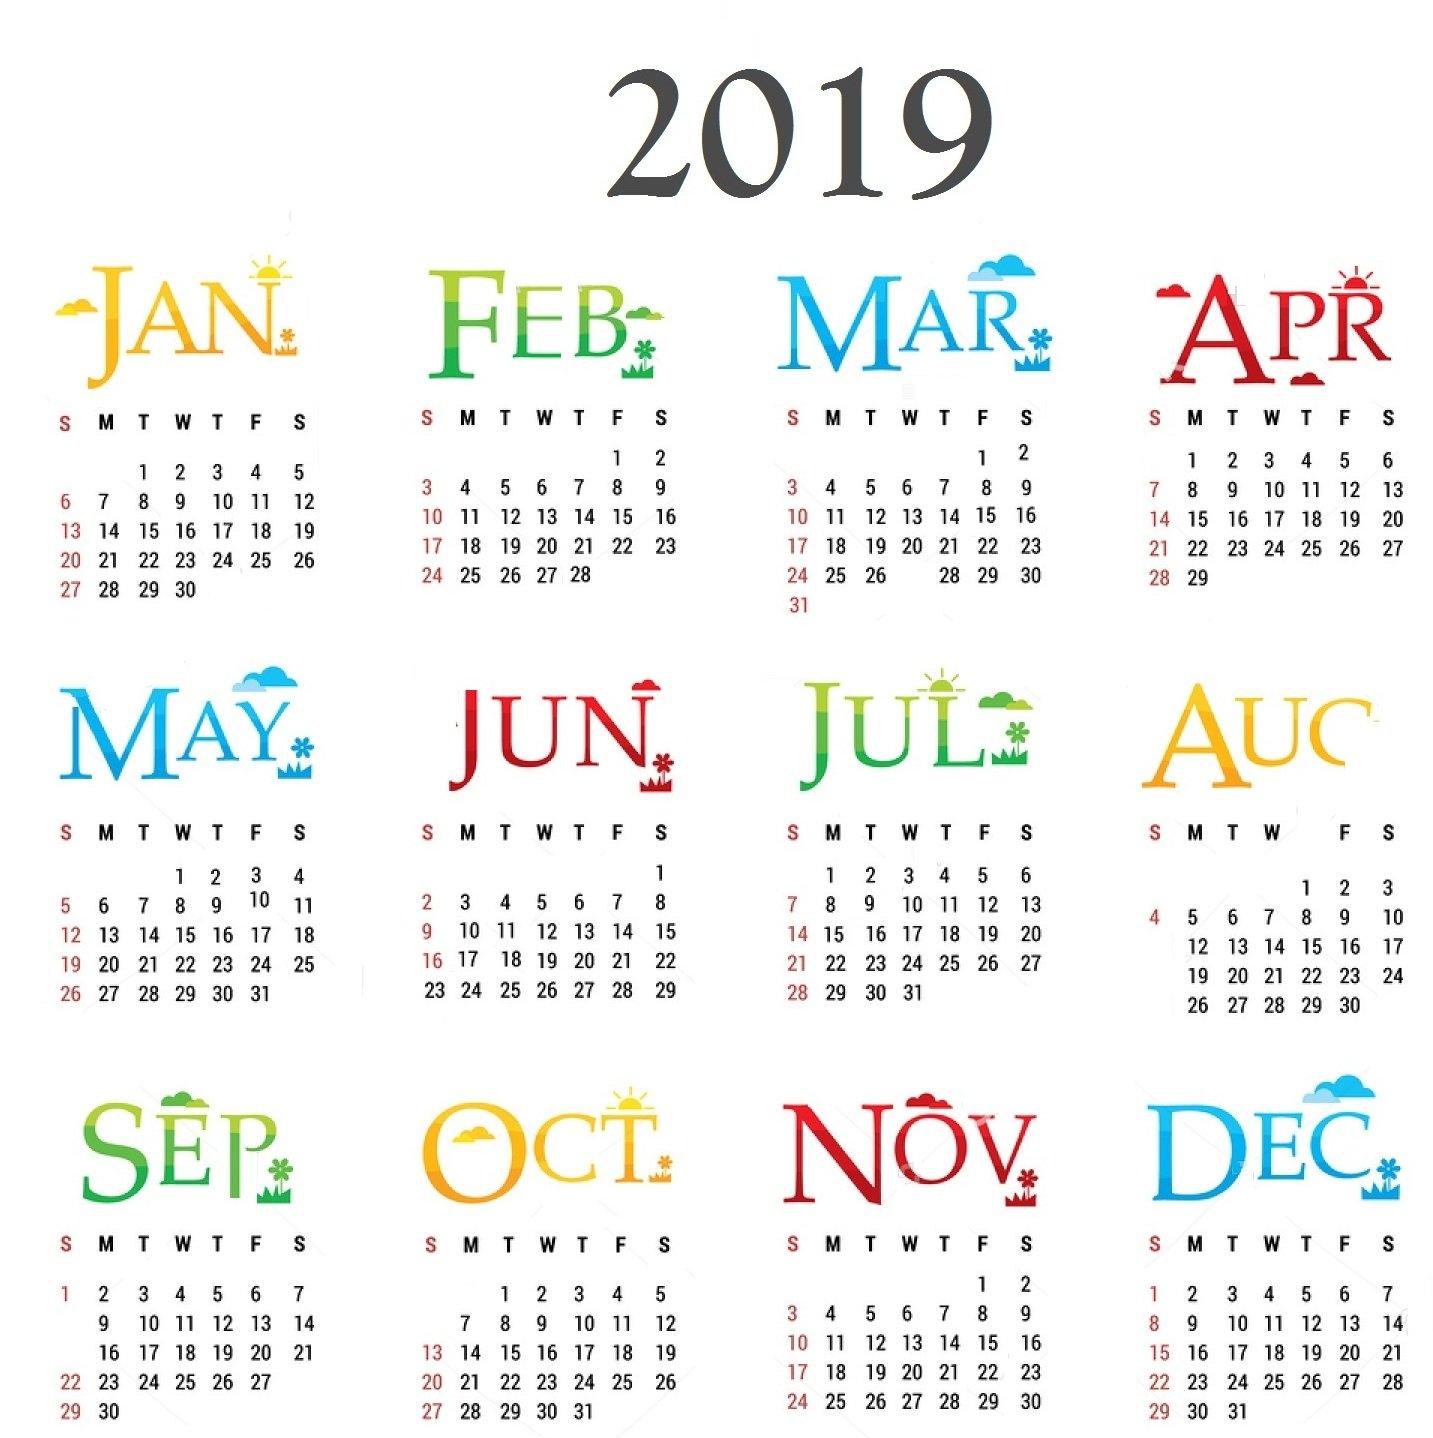 Free Yearly Calendar 2019 With Holidays | Free Printable 2018 Calendar 2019 Pdf